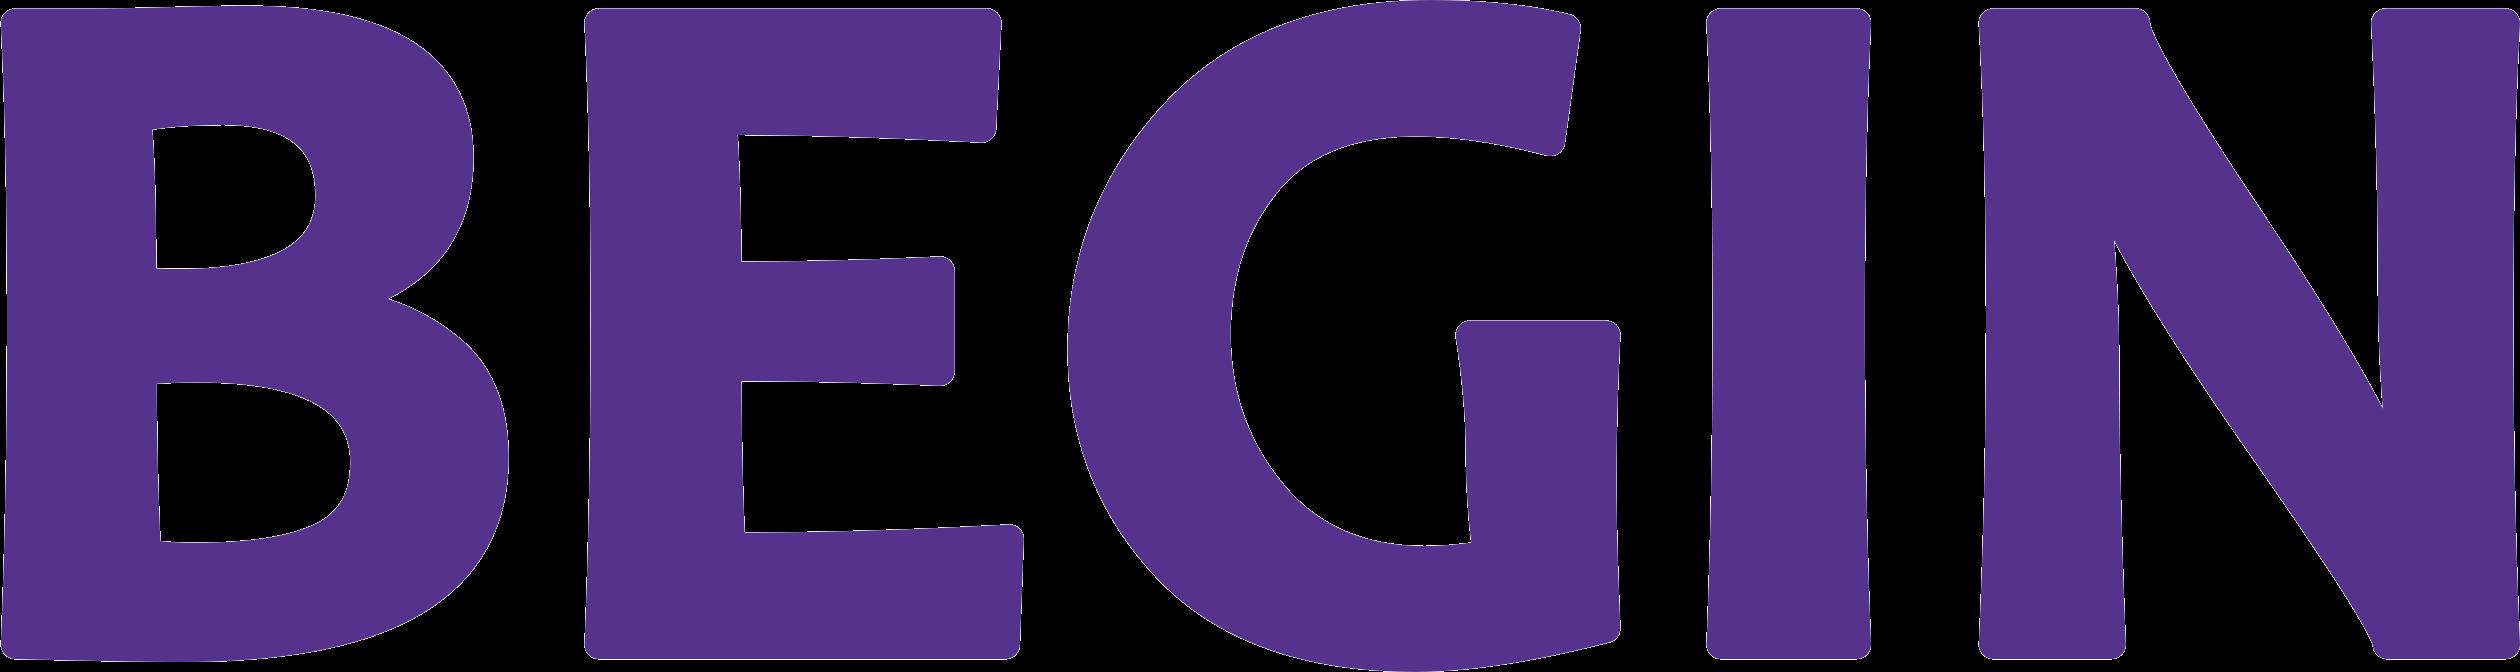 Girioli.com Logotipo